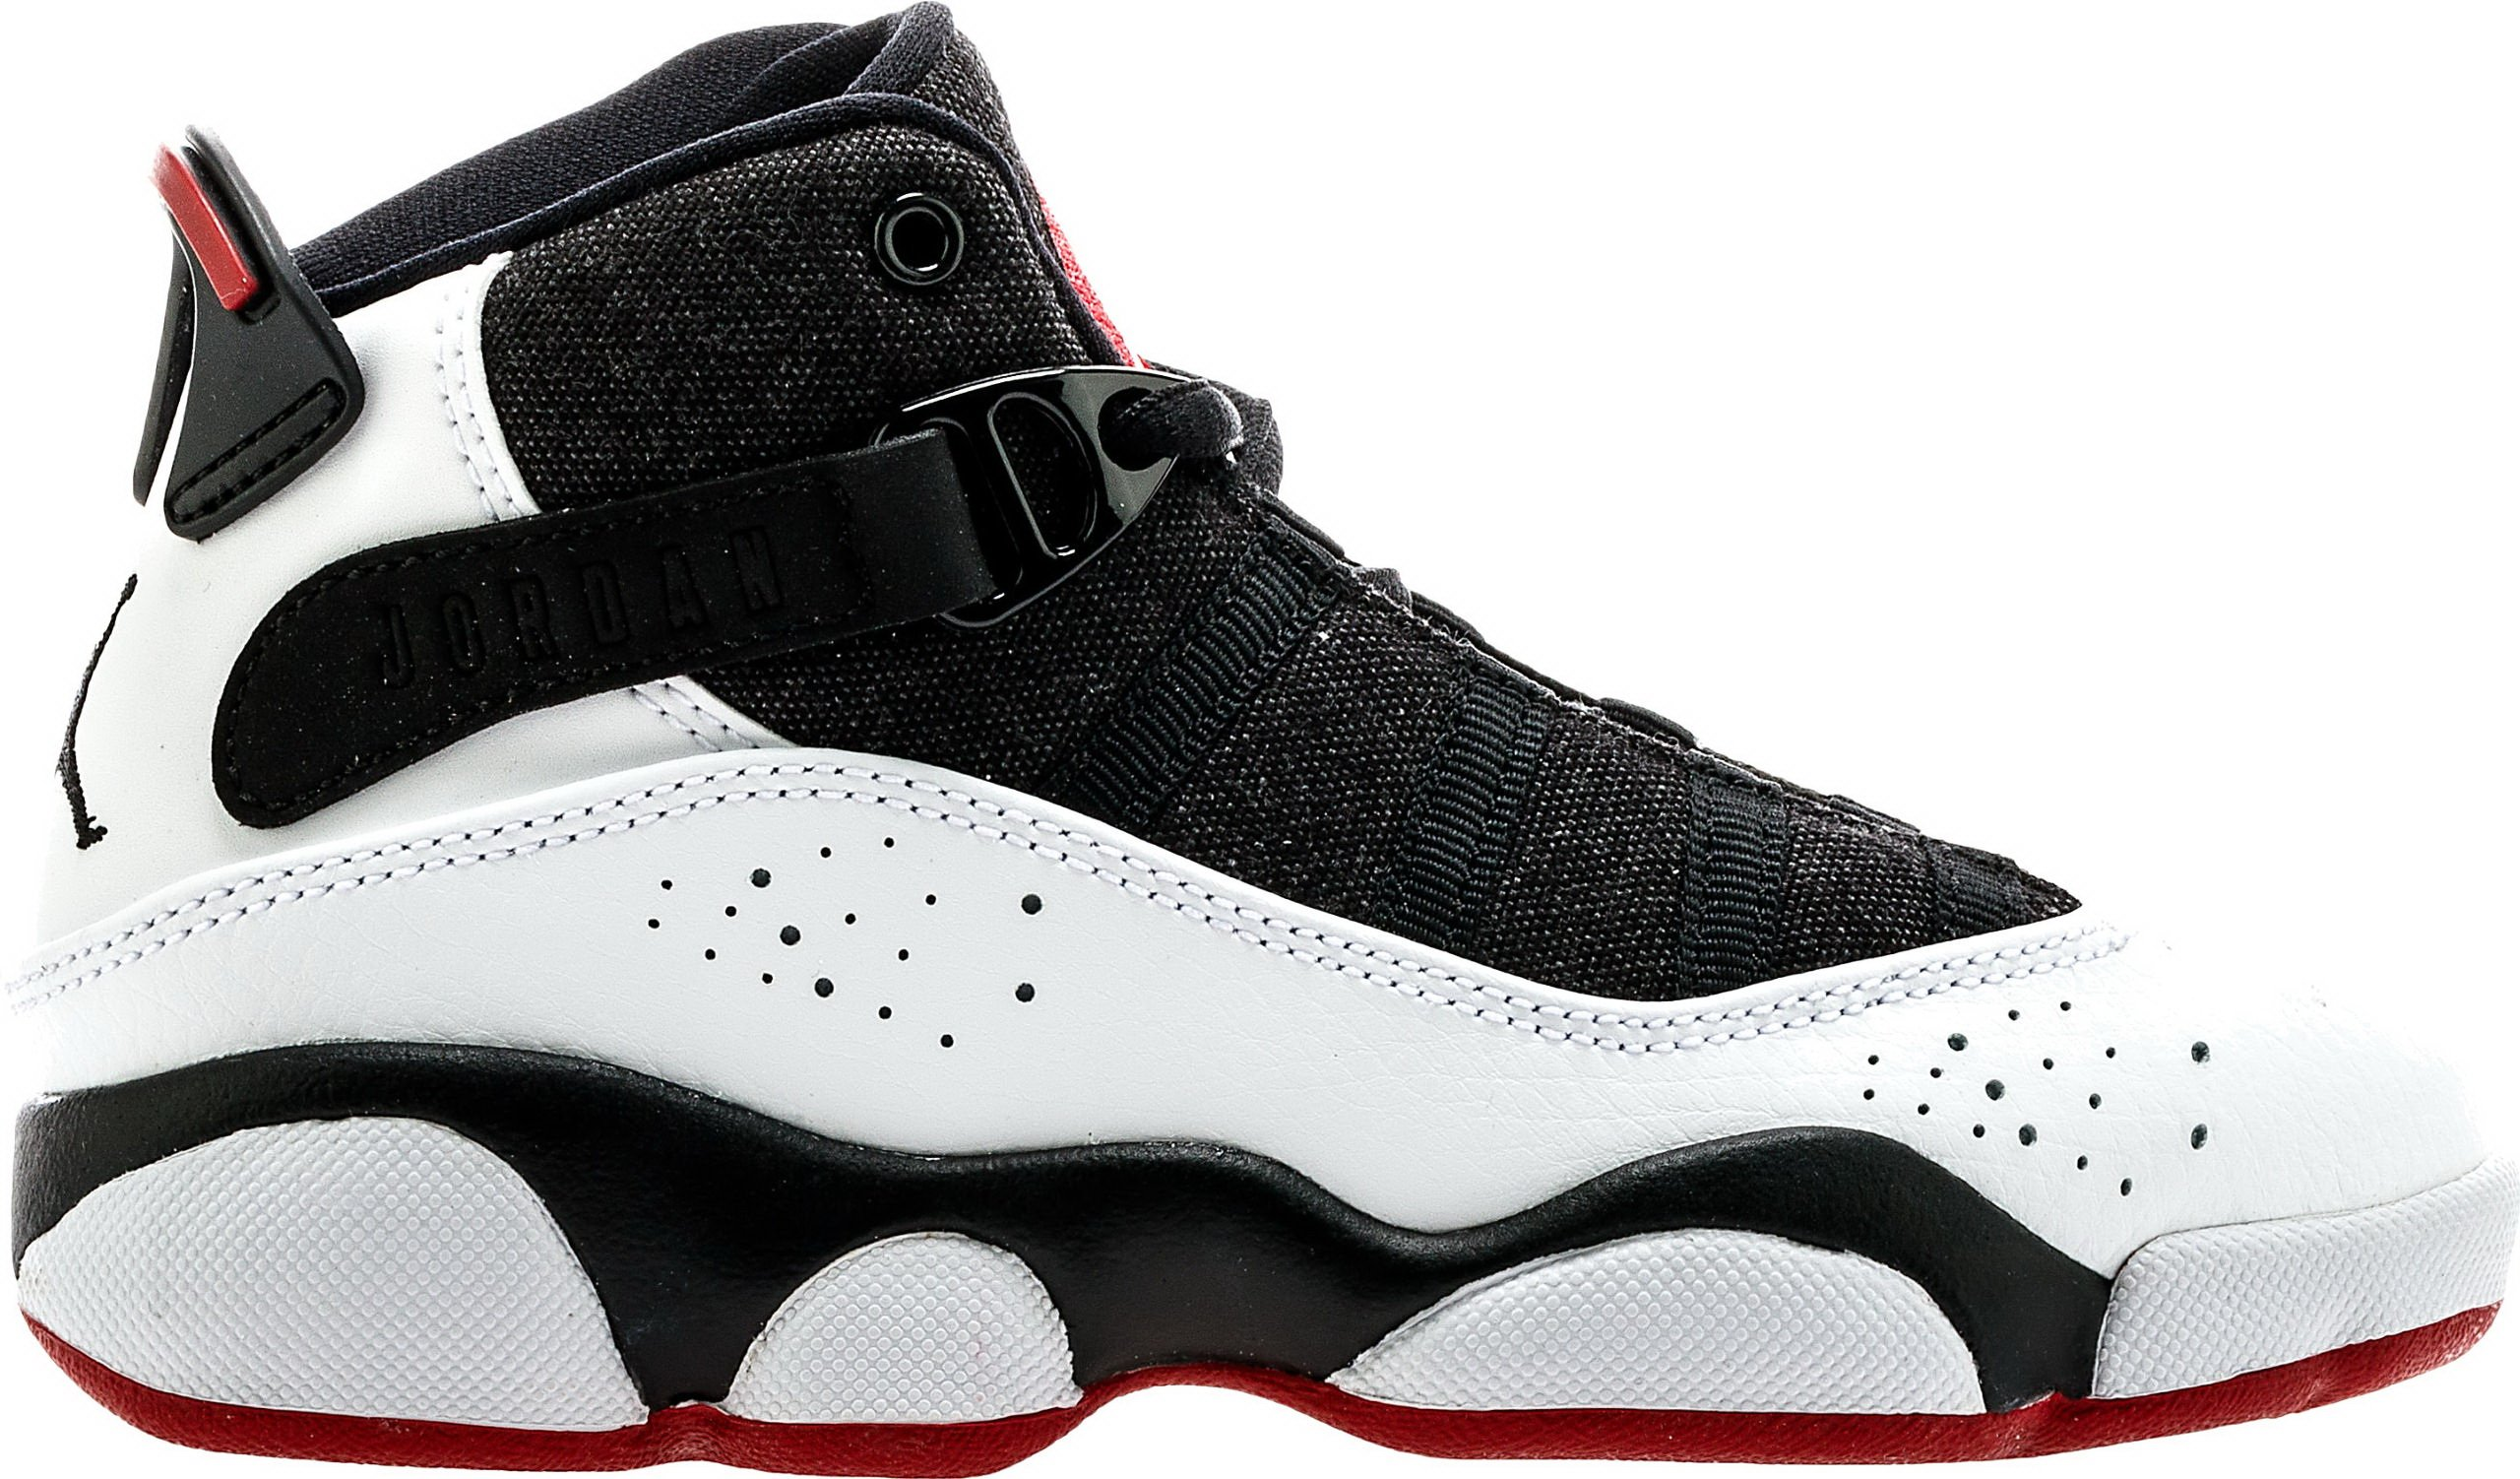 Jordan 323432-012 Air Jordan 6 Rings Preschool Basketball Shoe by Jordan